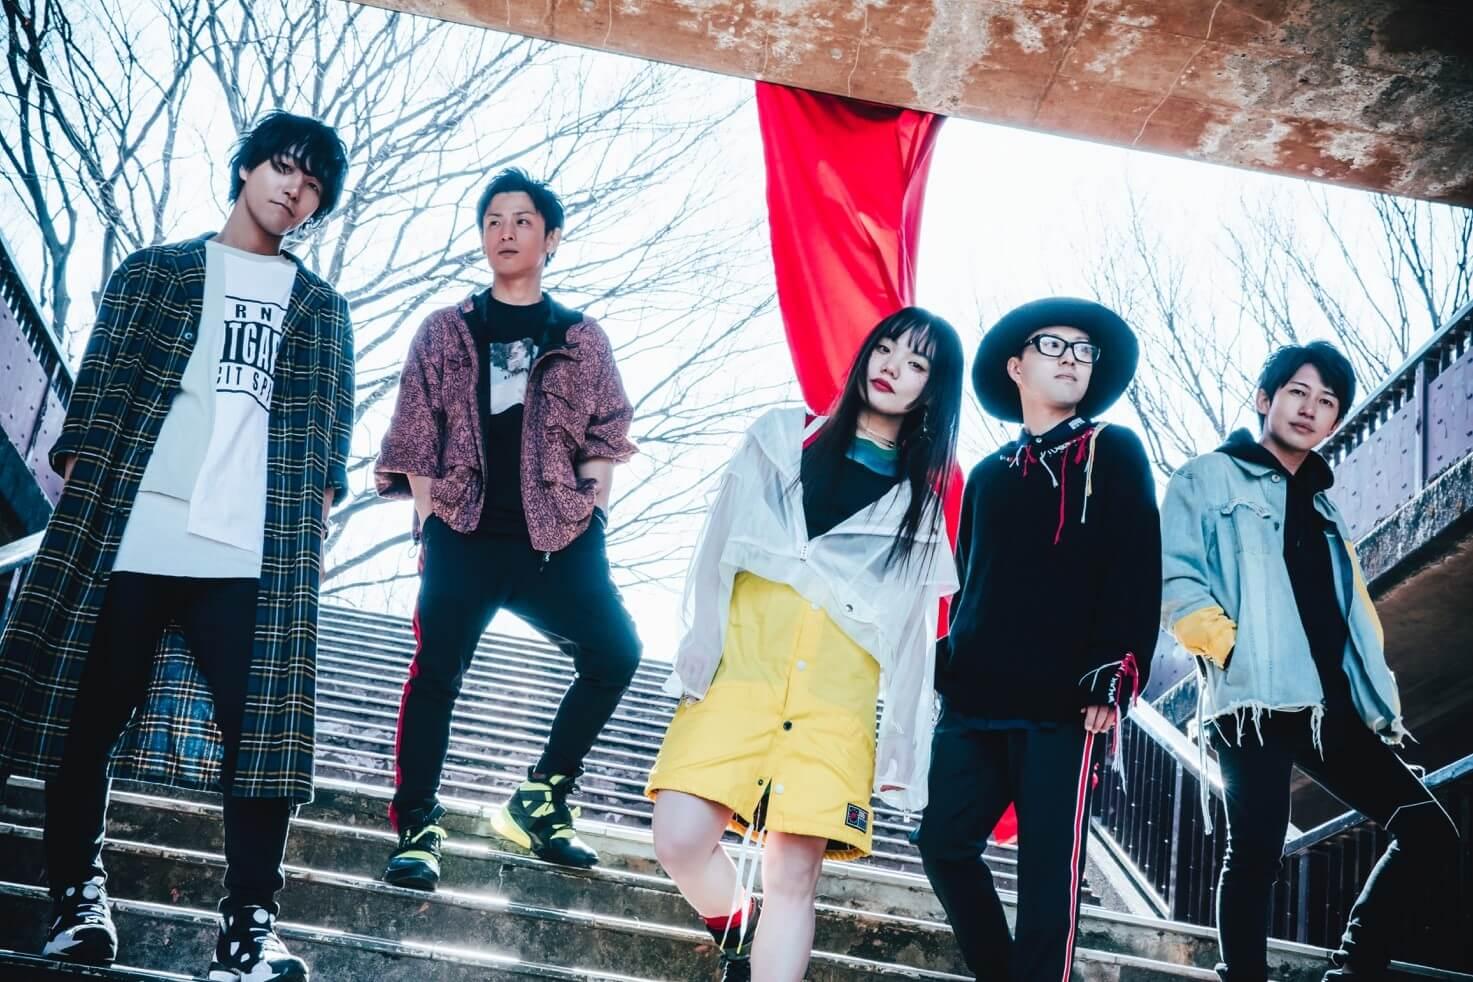 vivid undressが結成5周年の集大成に初の東名阪ワンマンツアー発表サムネイル画像